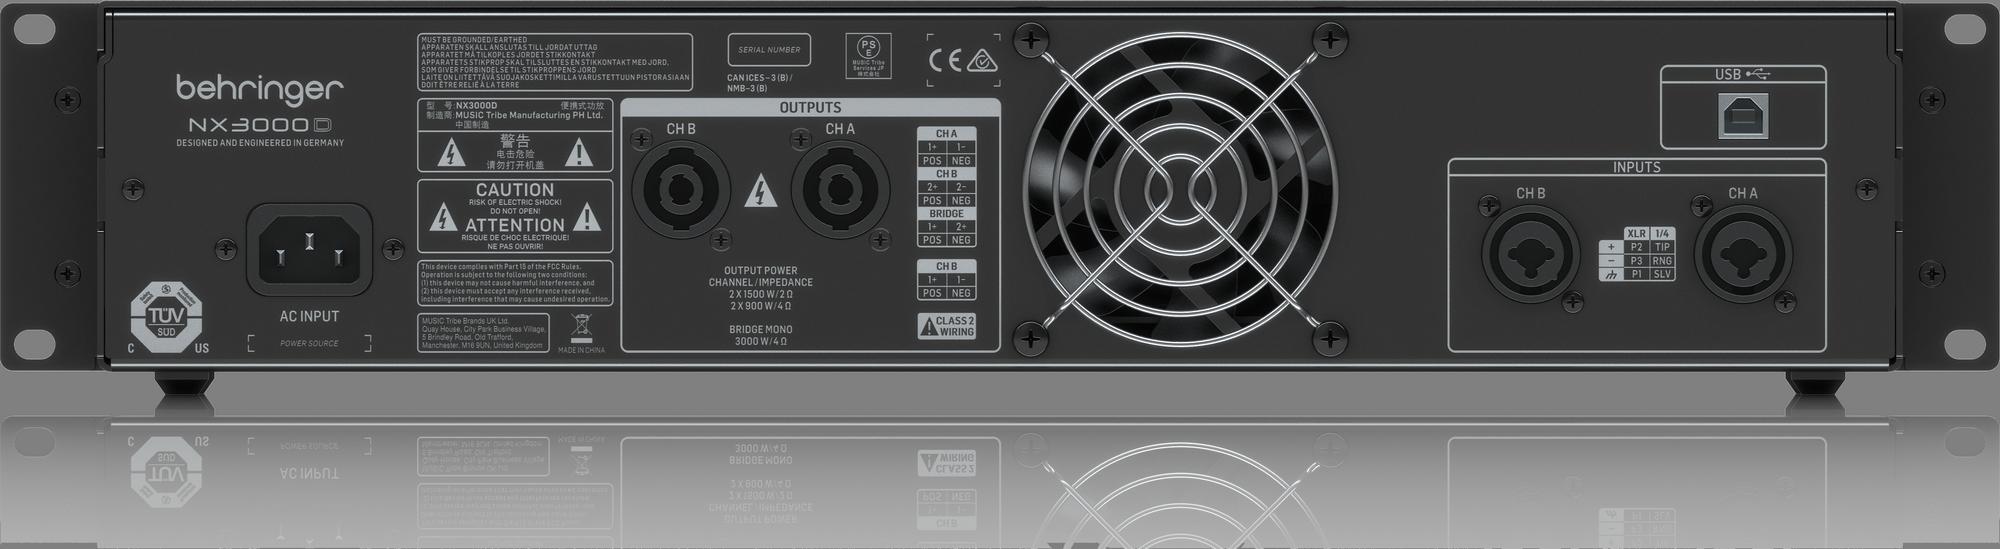 BEHRINGER NX3000D cyfrowy wzmacniacz 3000W DSP USB